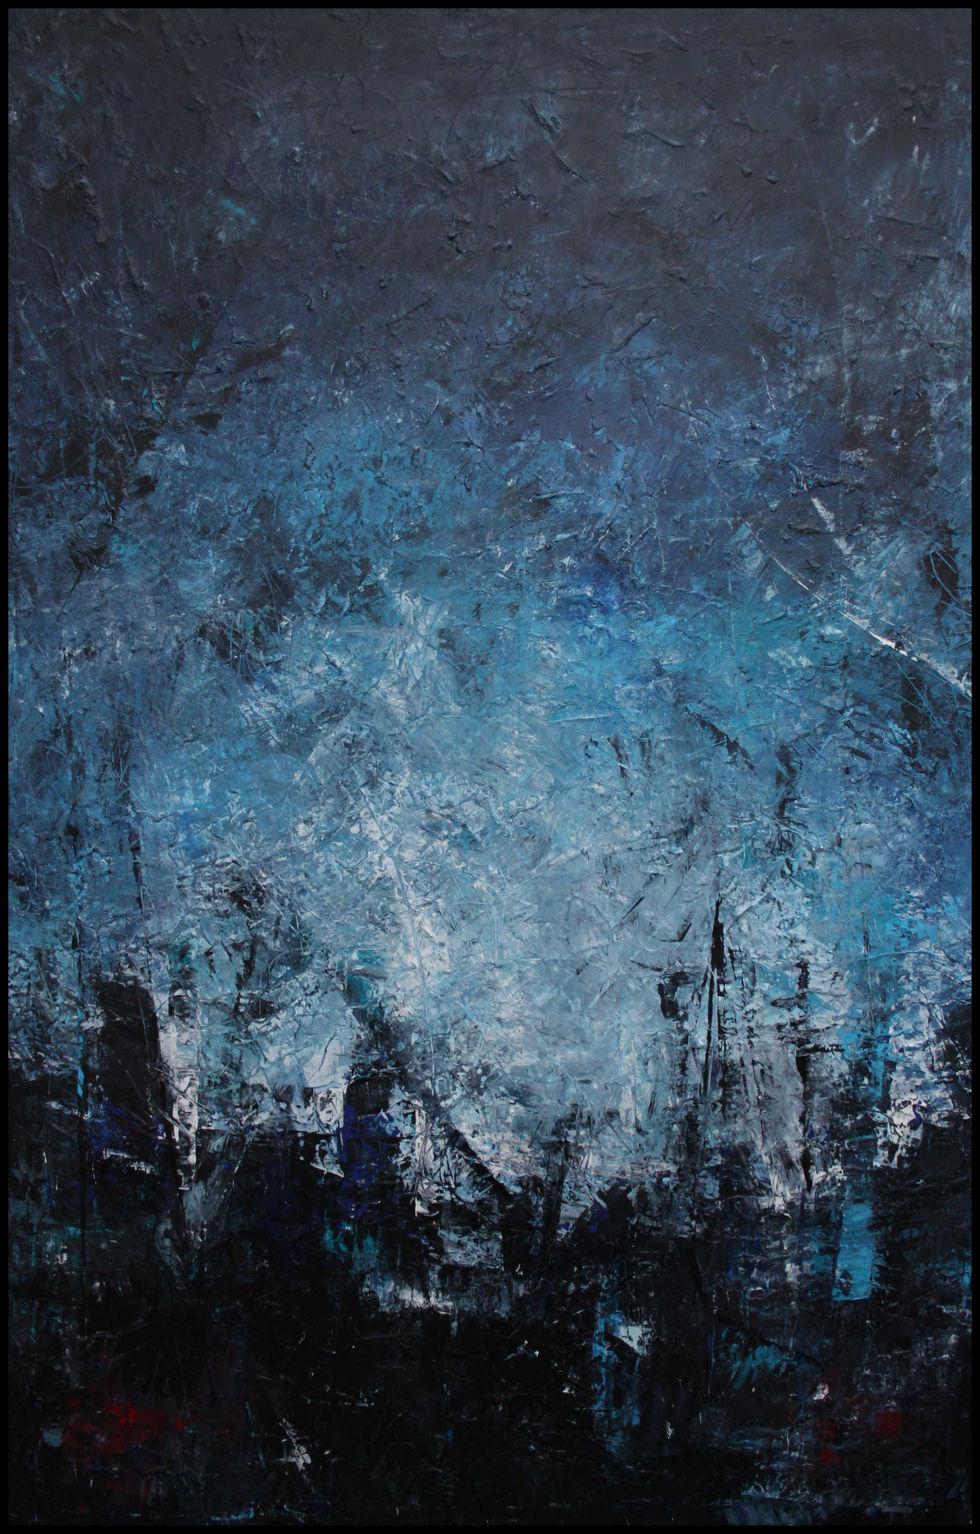 Framed-Black---William-Mills-Art.jpg